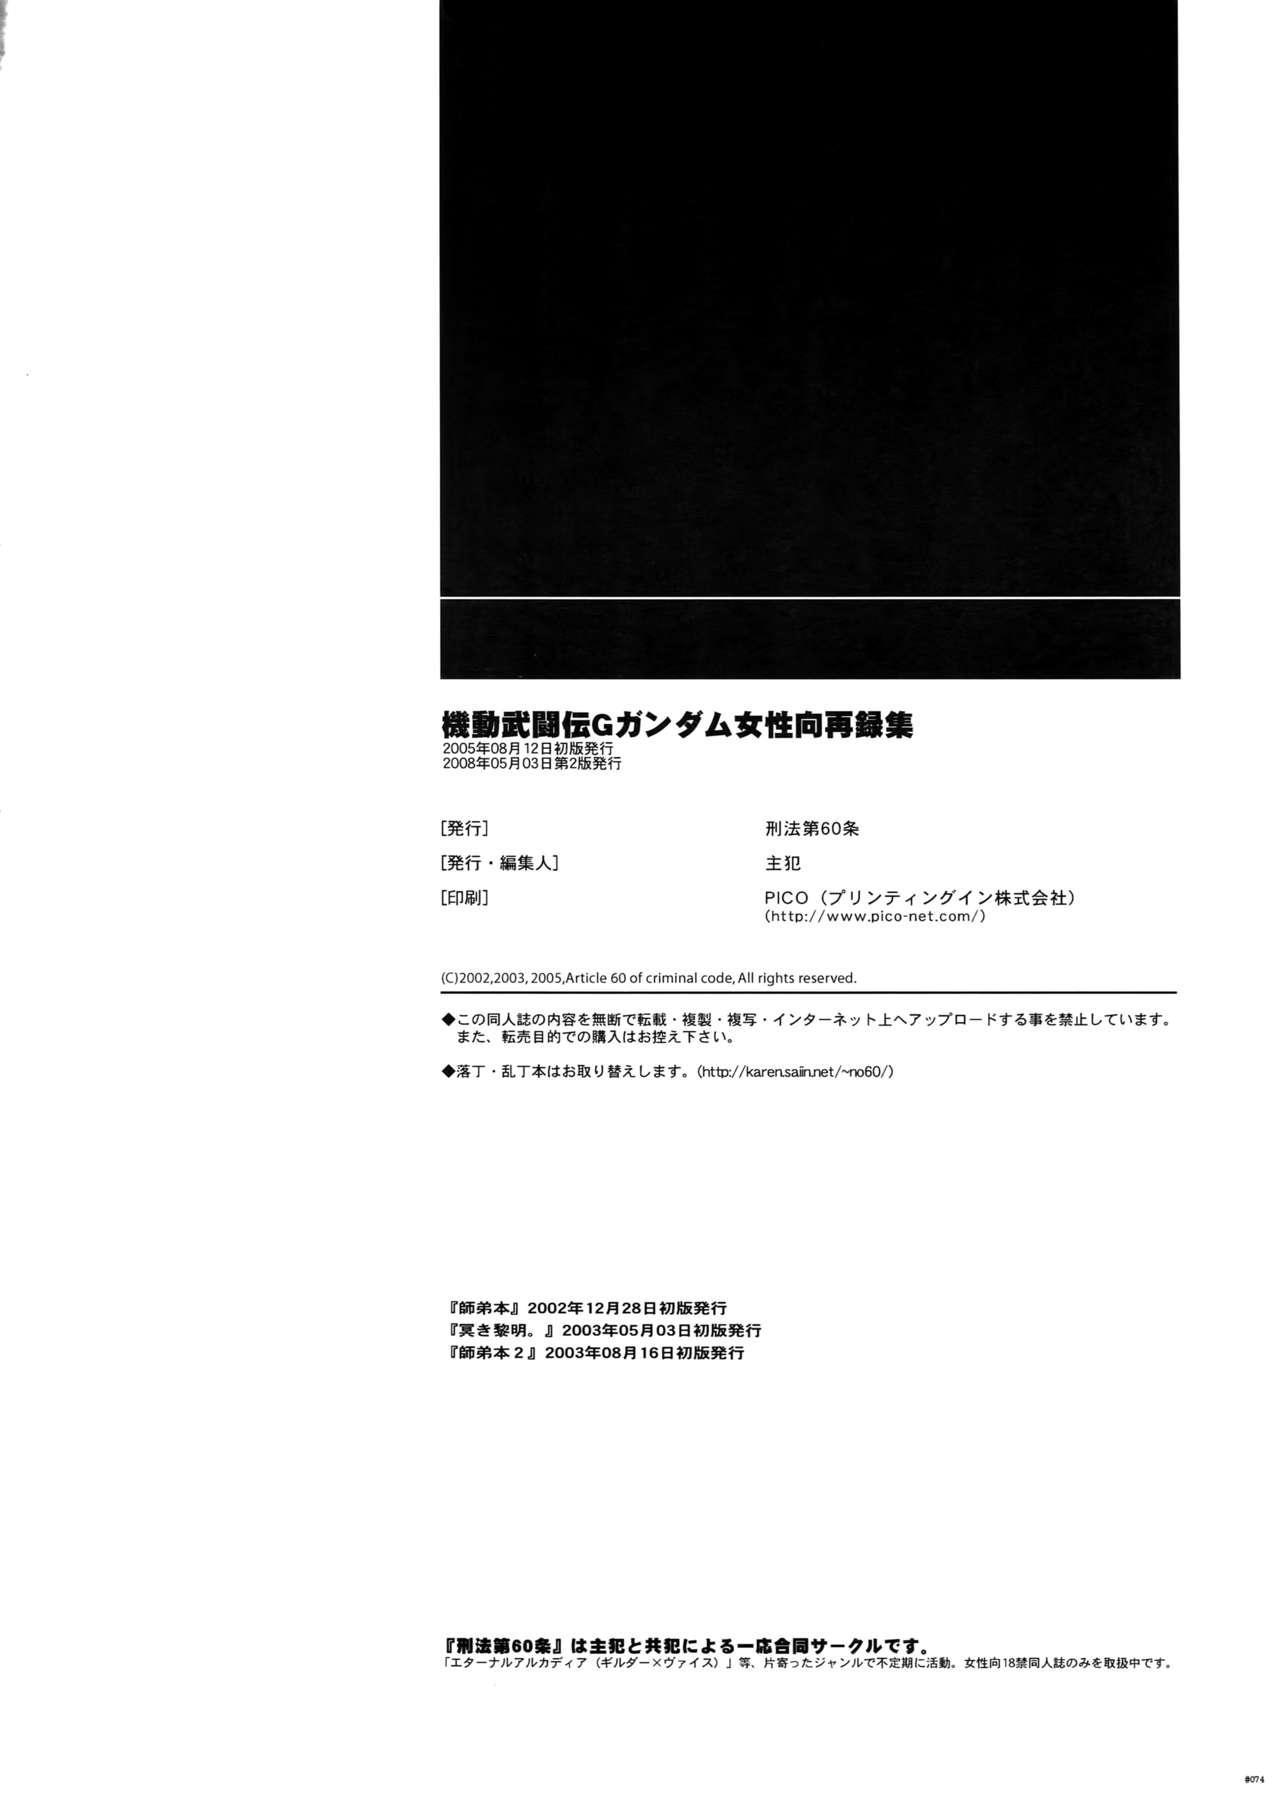 [Article 60 of Criminal Code (Shuhan)] G-gan Josei-Muke Sairoku-Shuu (G Gundam) 73